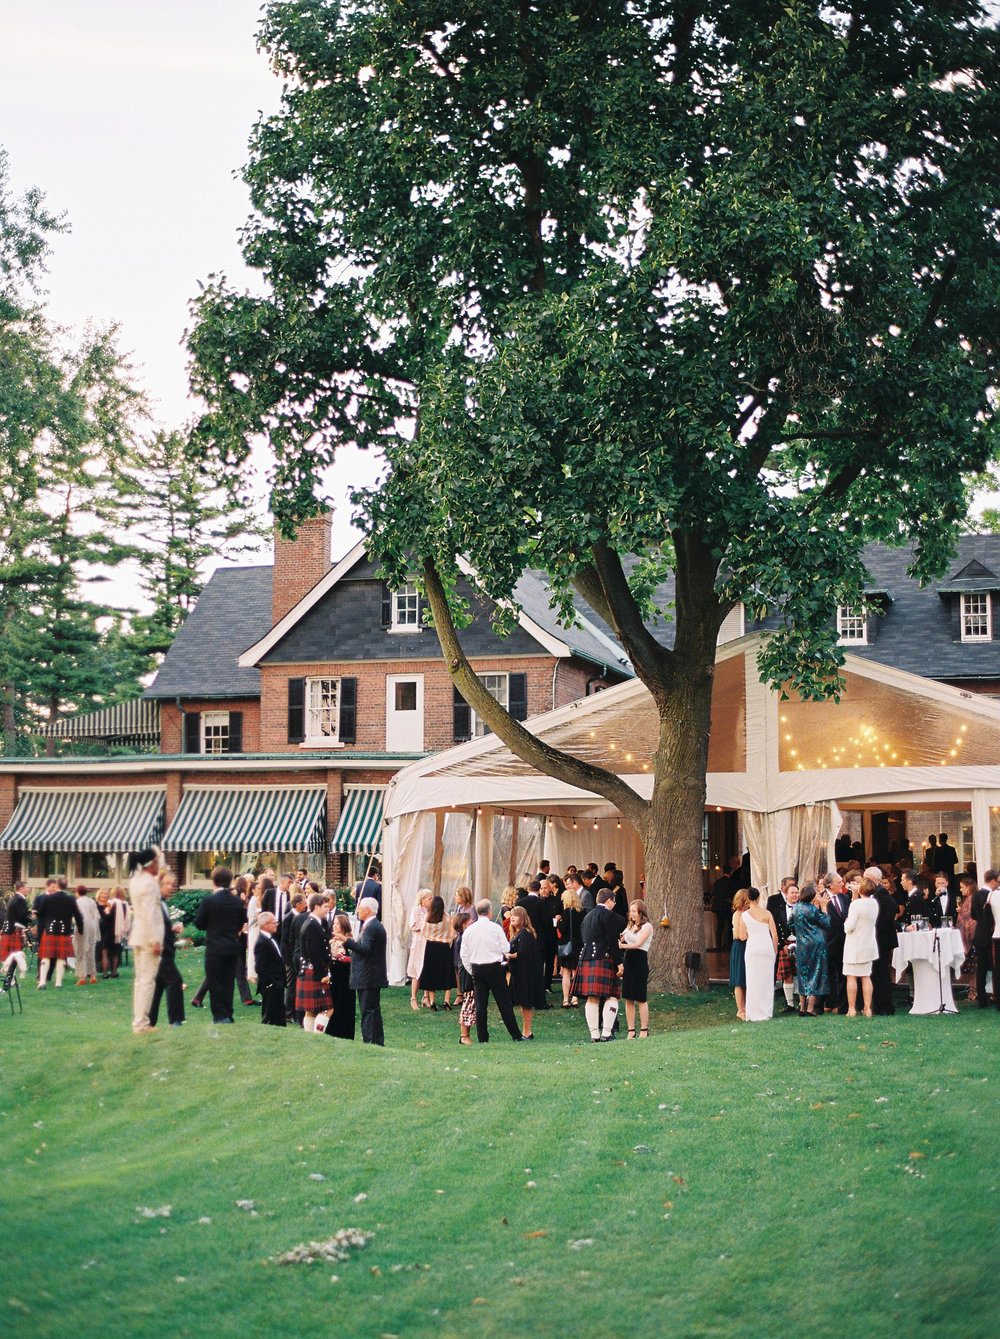 0716-Geneva-Ian-Wedding-Toronto Golf Club-When He Found Her-TorontoPhotographer.jpg